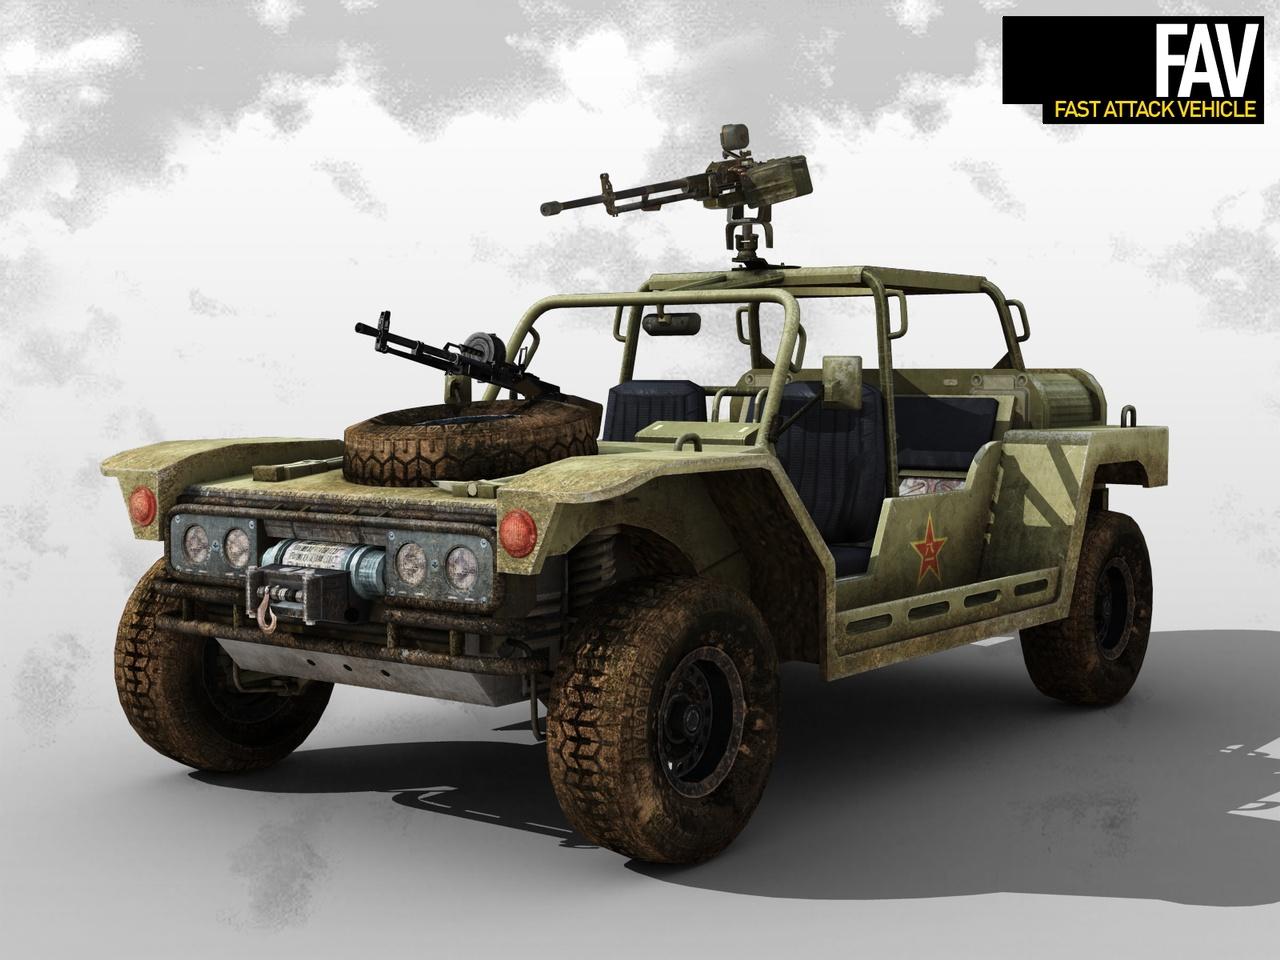 Fast Attack Vehicle | Dragon Rising Wiki | FANDOM powered ...